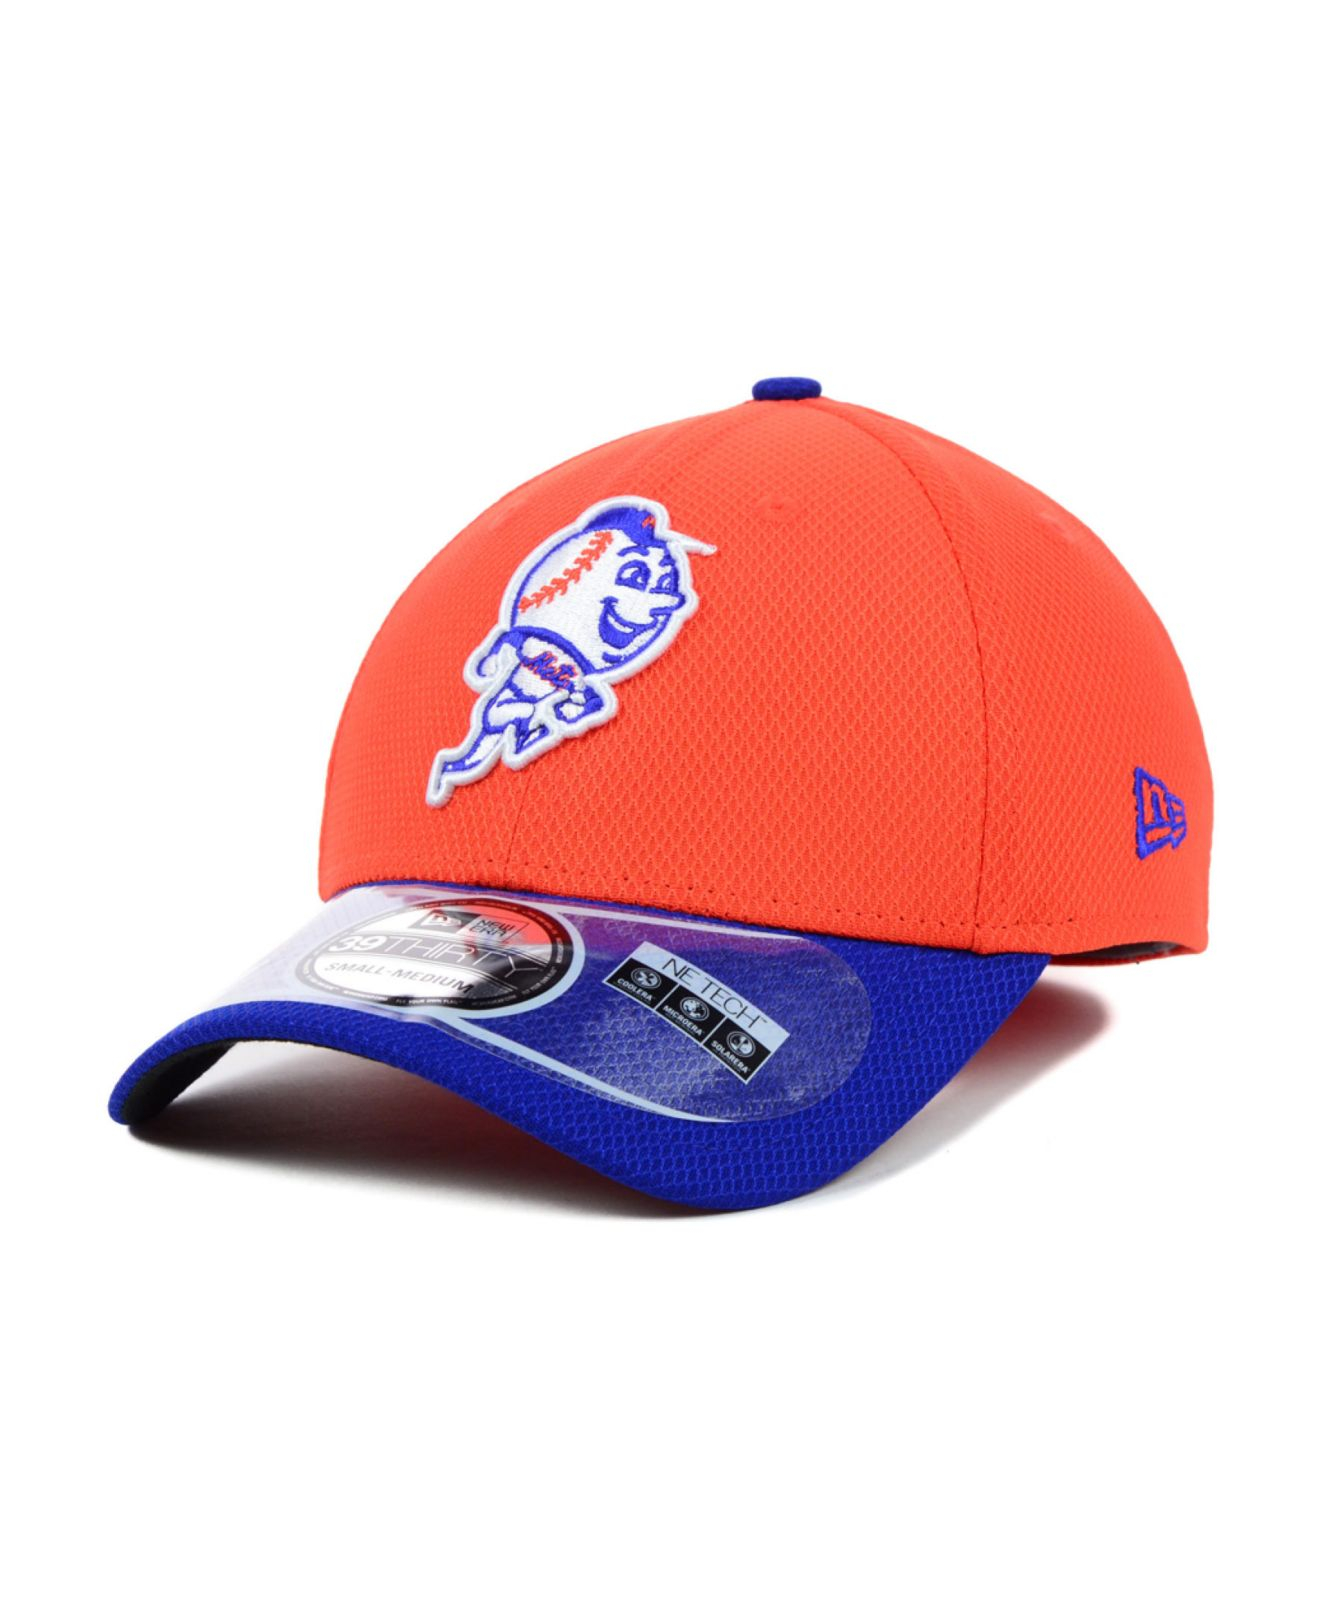 reputable site b214c 4e0aa shop lyst ktz new york mets diamond era 2 tone 39thirty cap in orange for  men